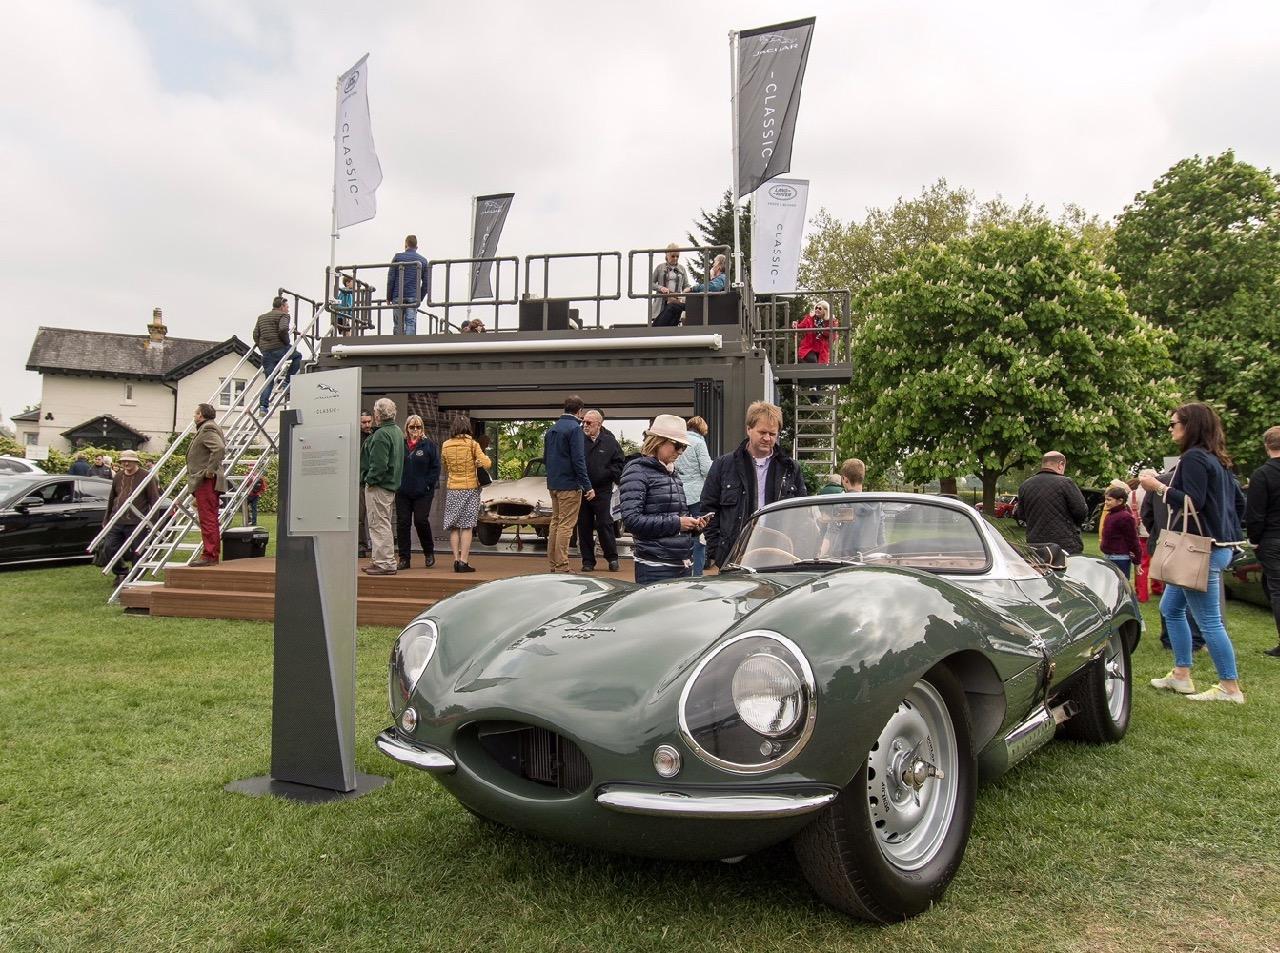 Cool cats: 1,200+ Jaguars gather at Windsor Castle - ClassicCars.com ...